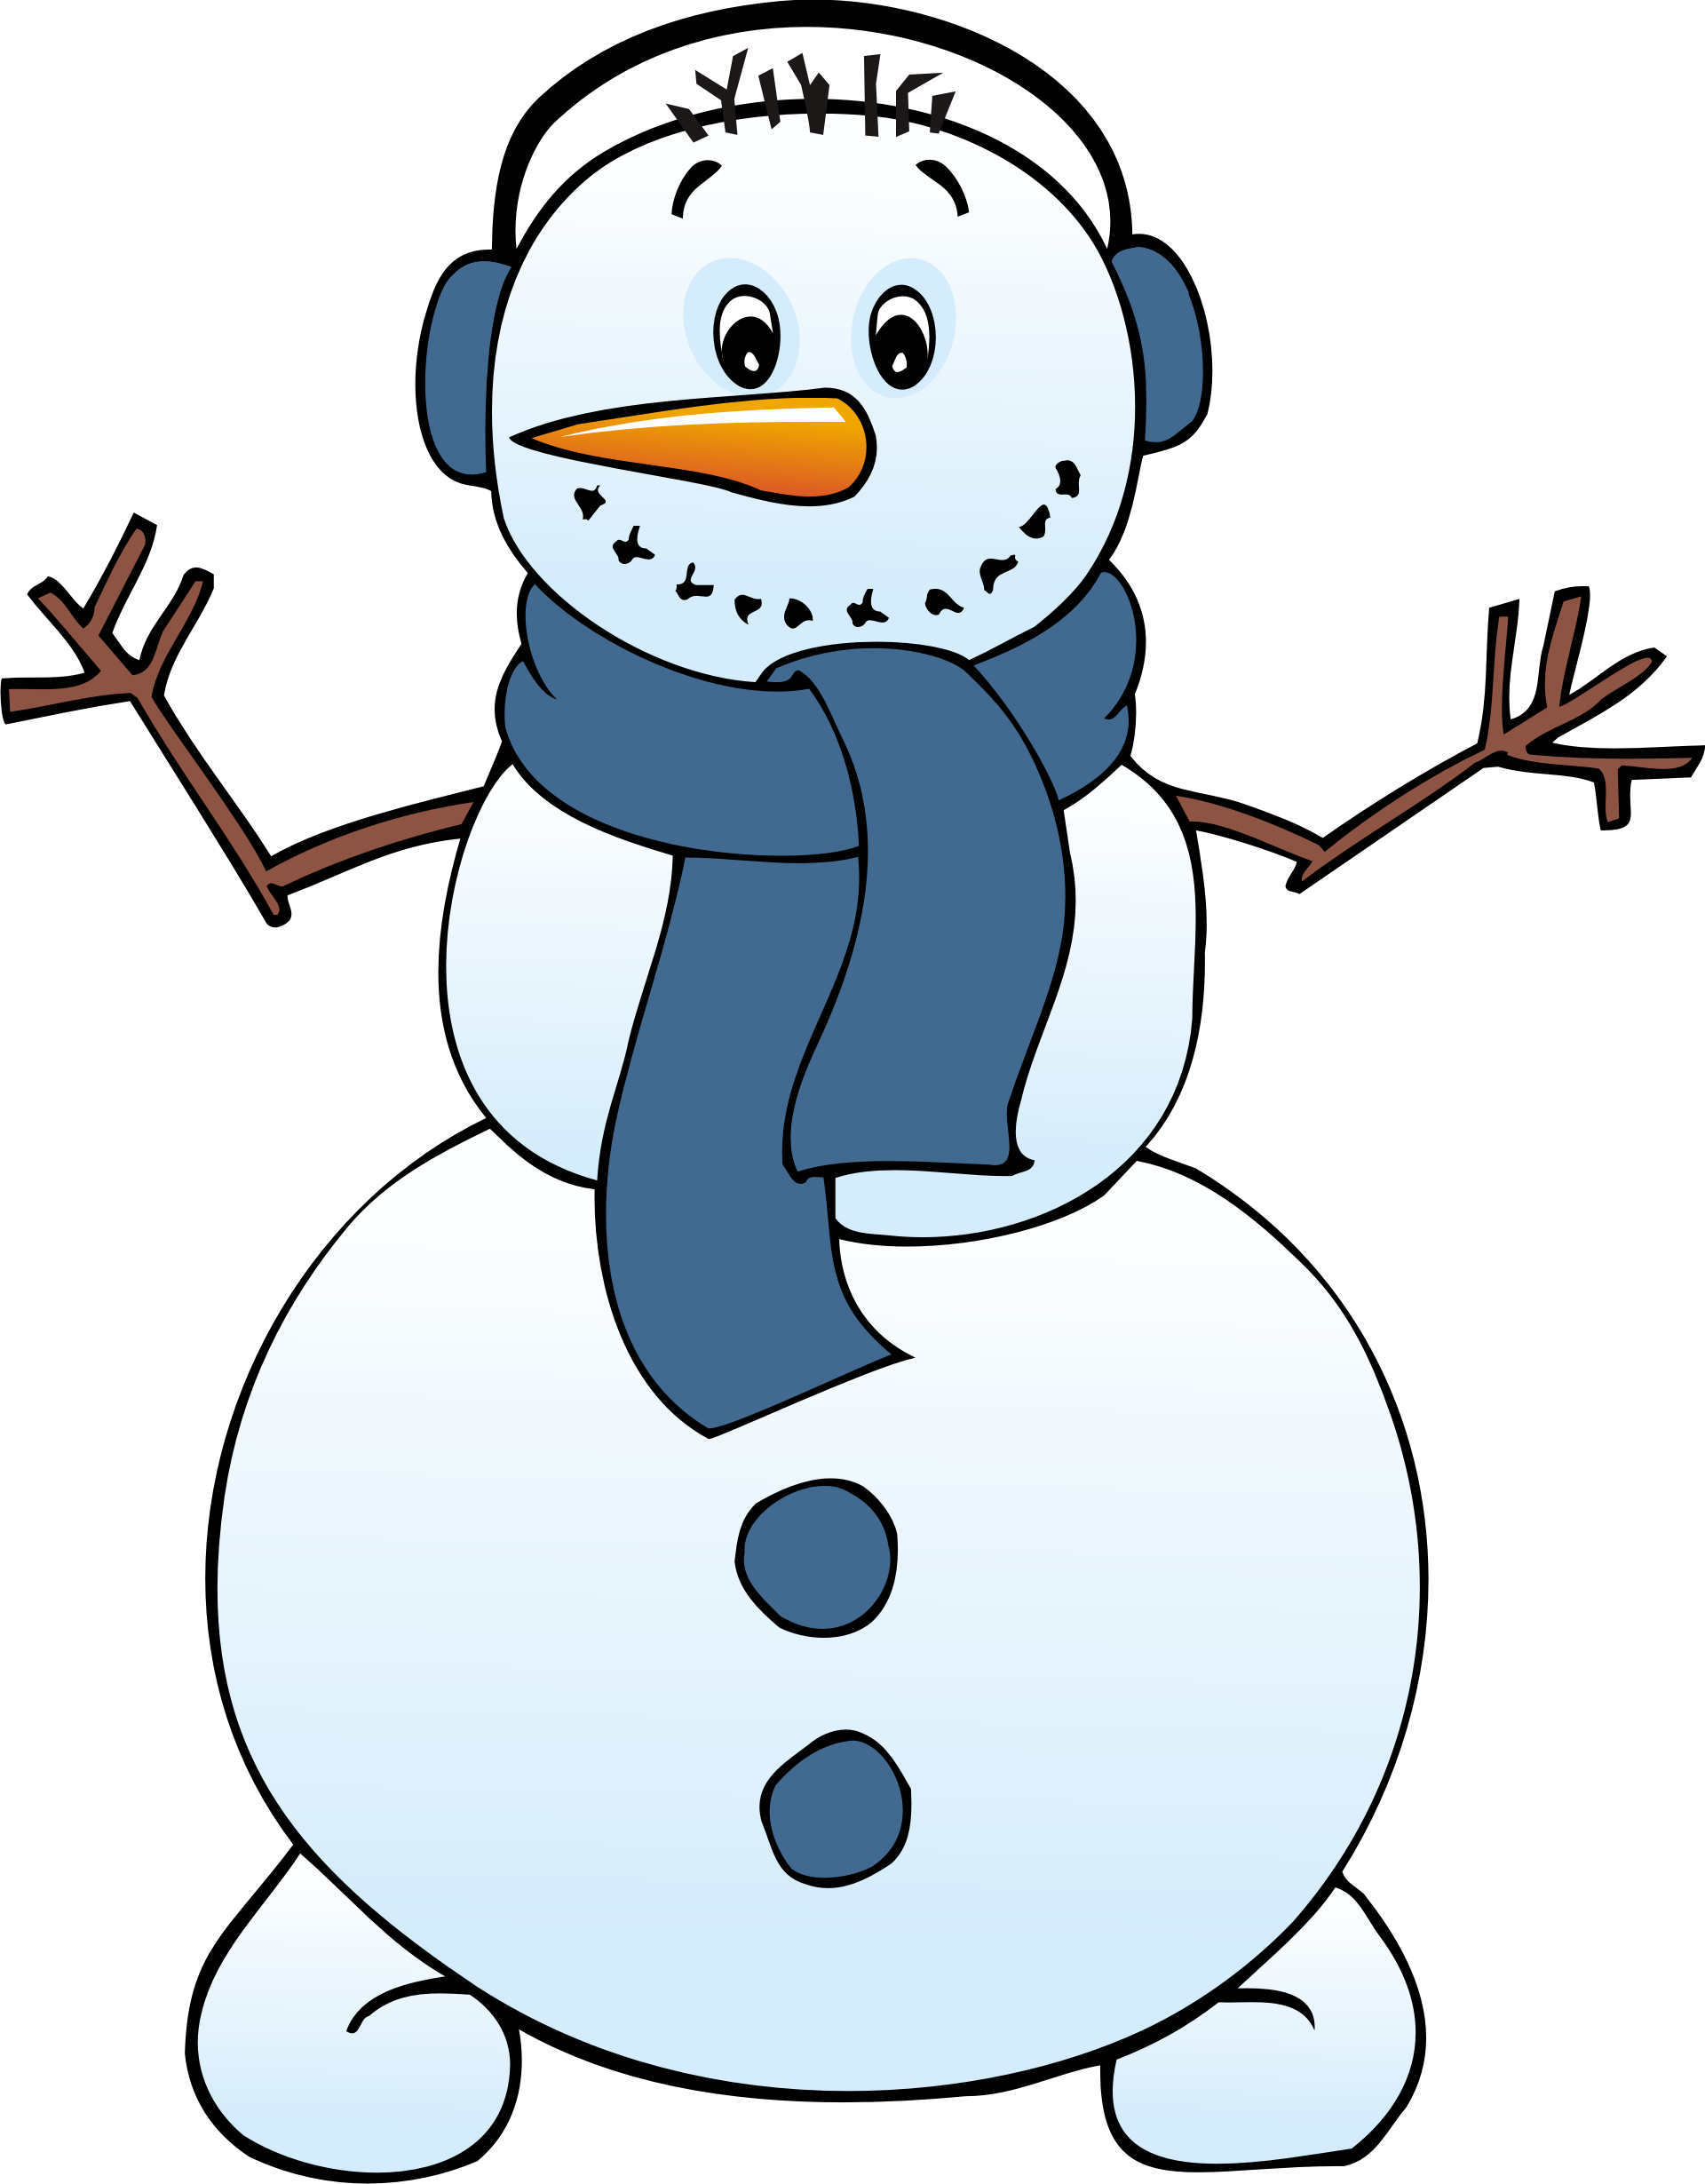 medium resolution of cute snowman clip art free snowman clipart free cliparts that you can download to you